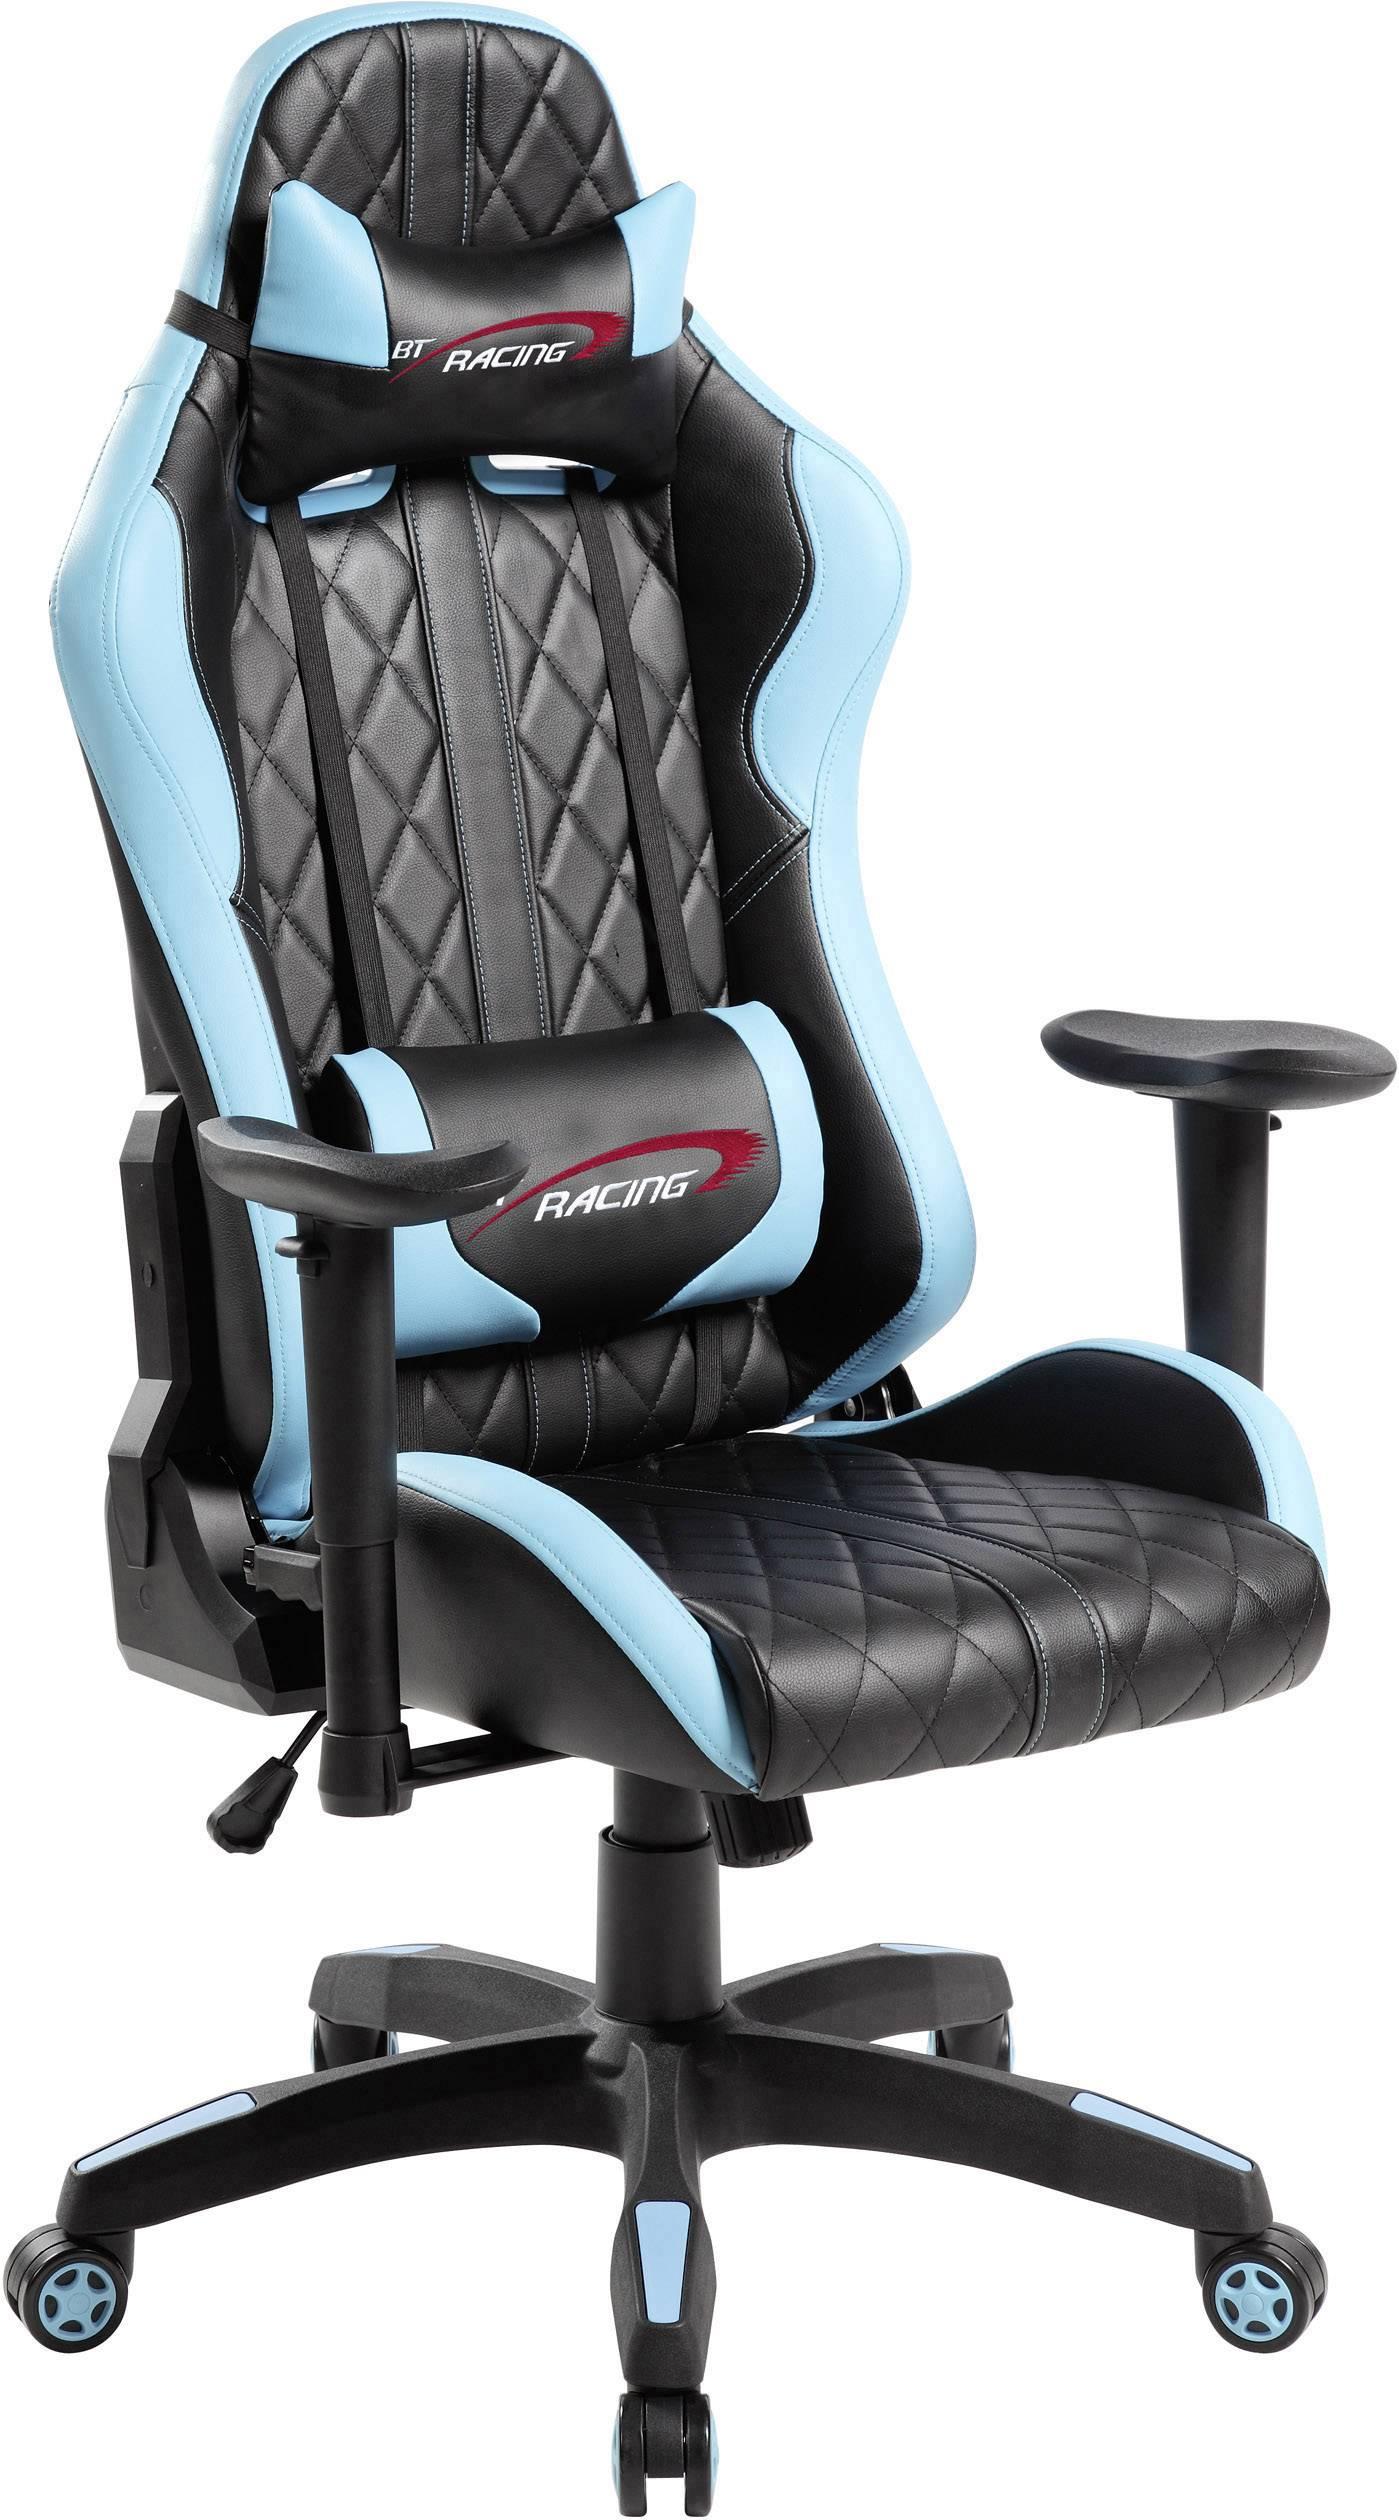 Sedia da gioco BT Racing Blu